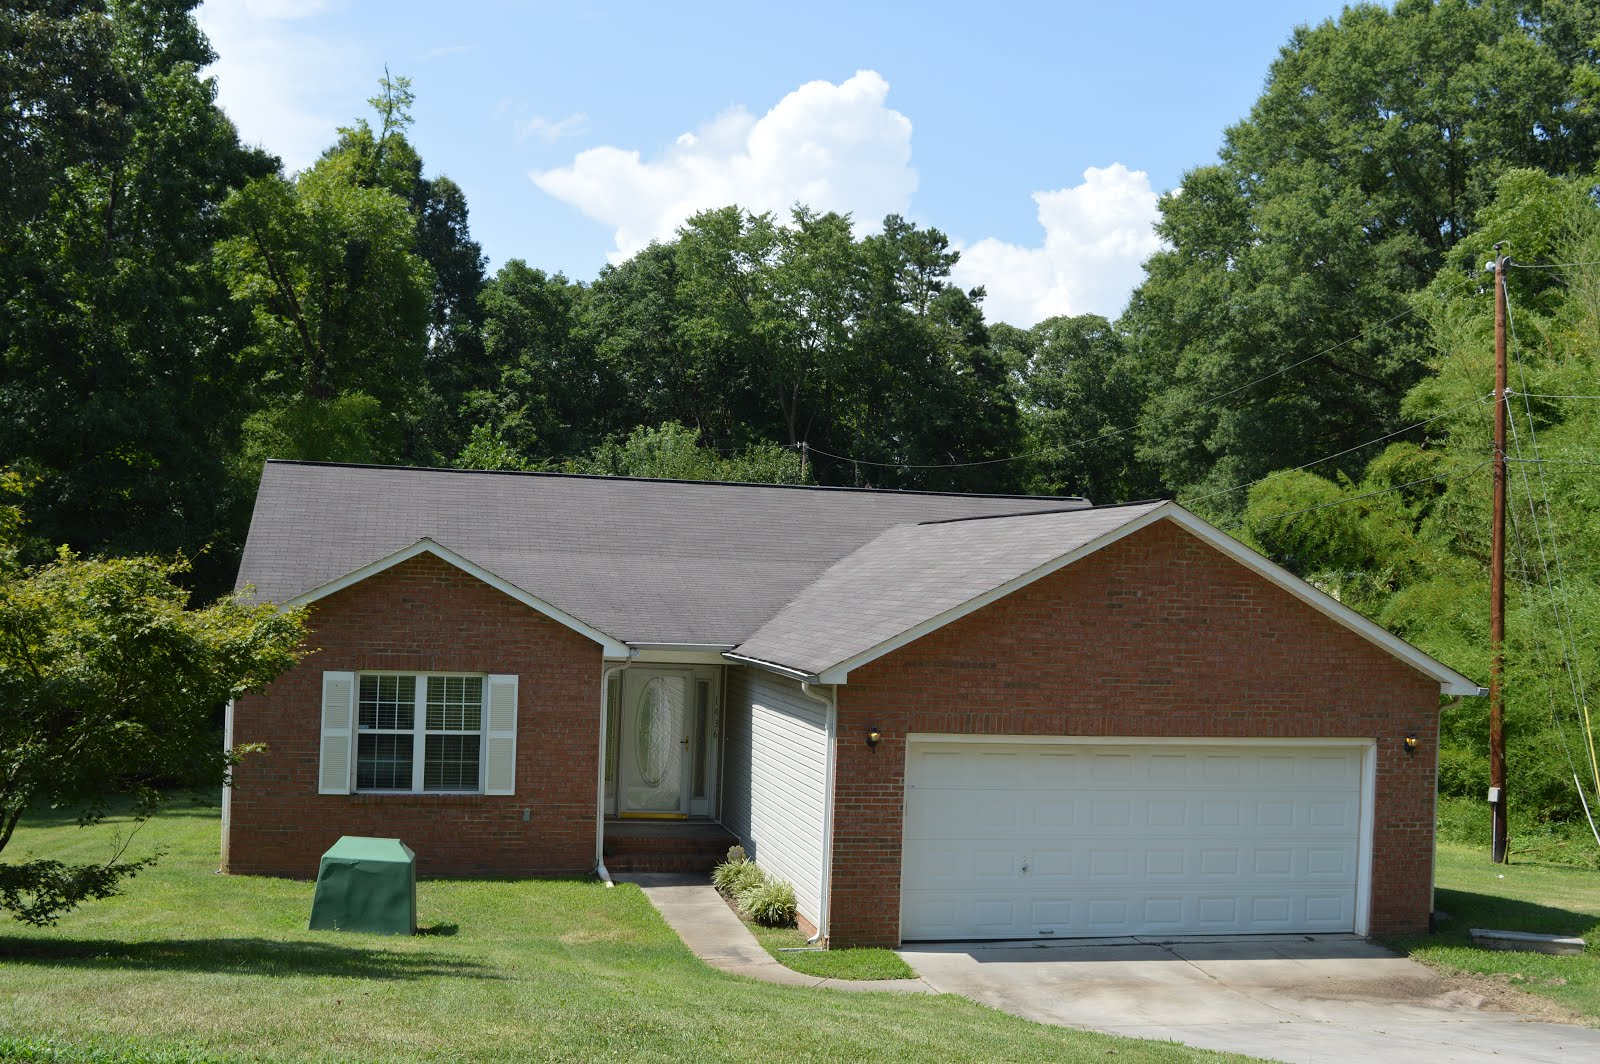 1436 N. Church Street, Salisbury NC 28144 ~ $125,000